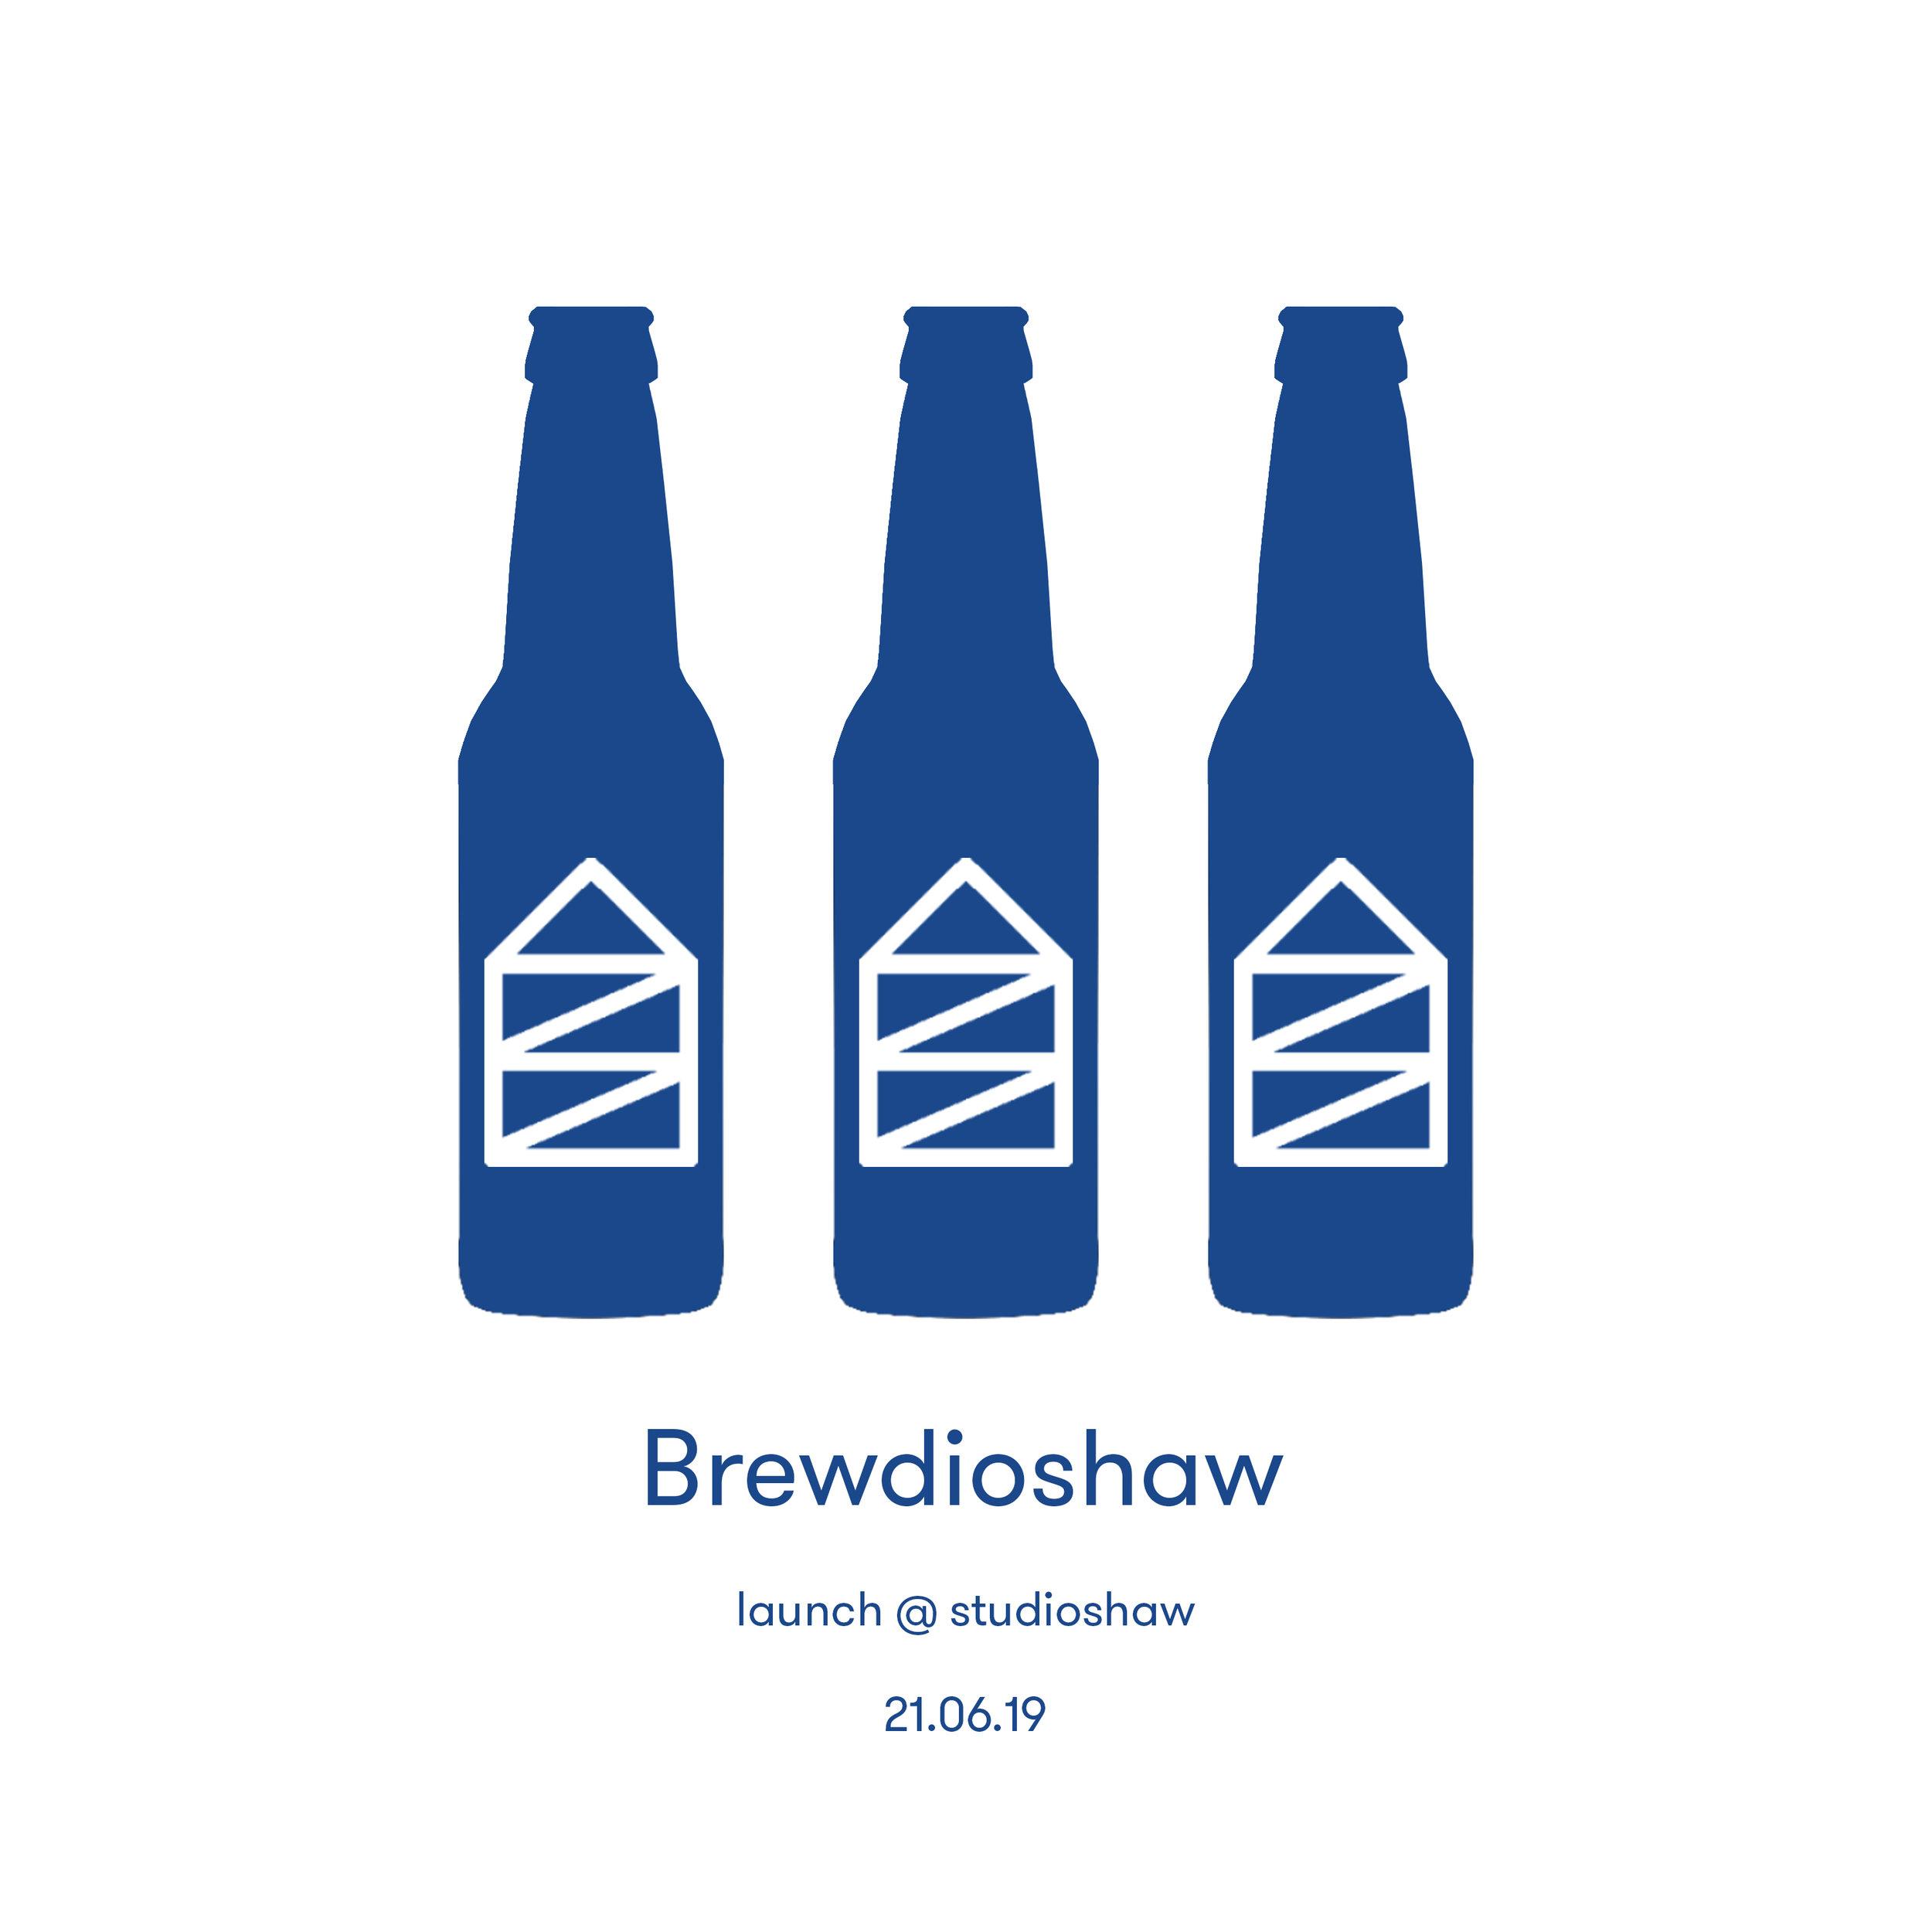 Brewdioshaw.jpg